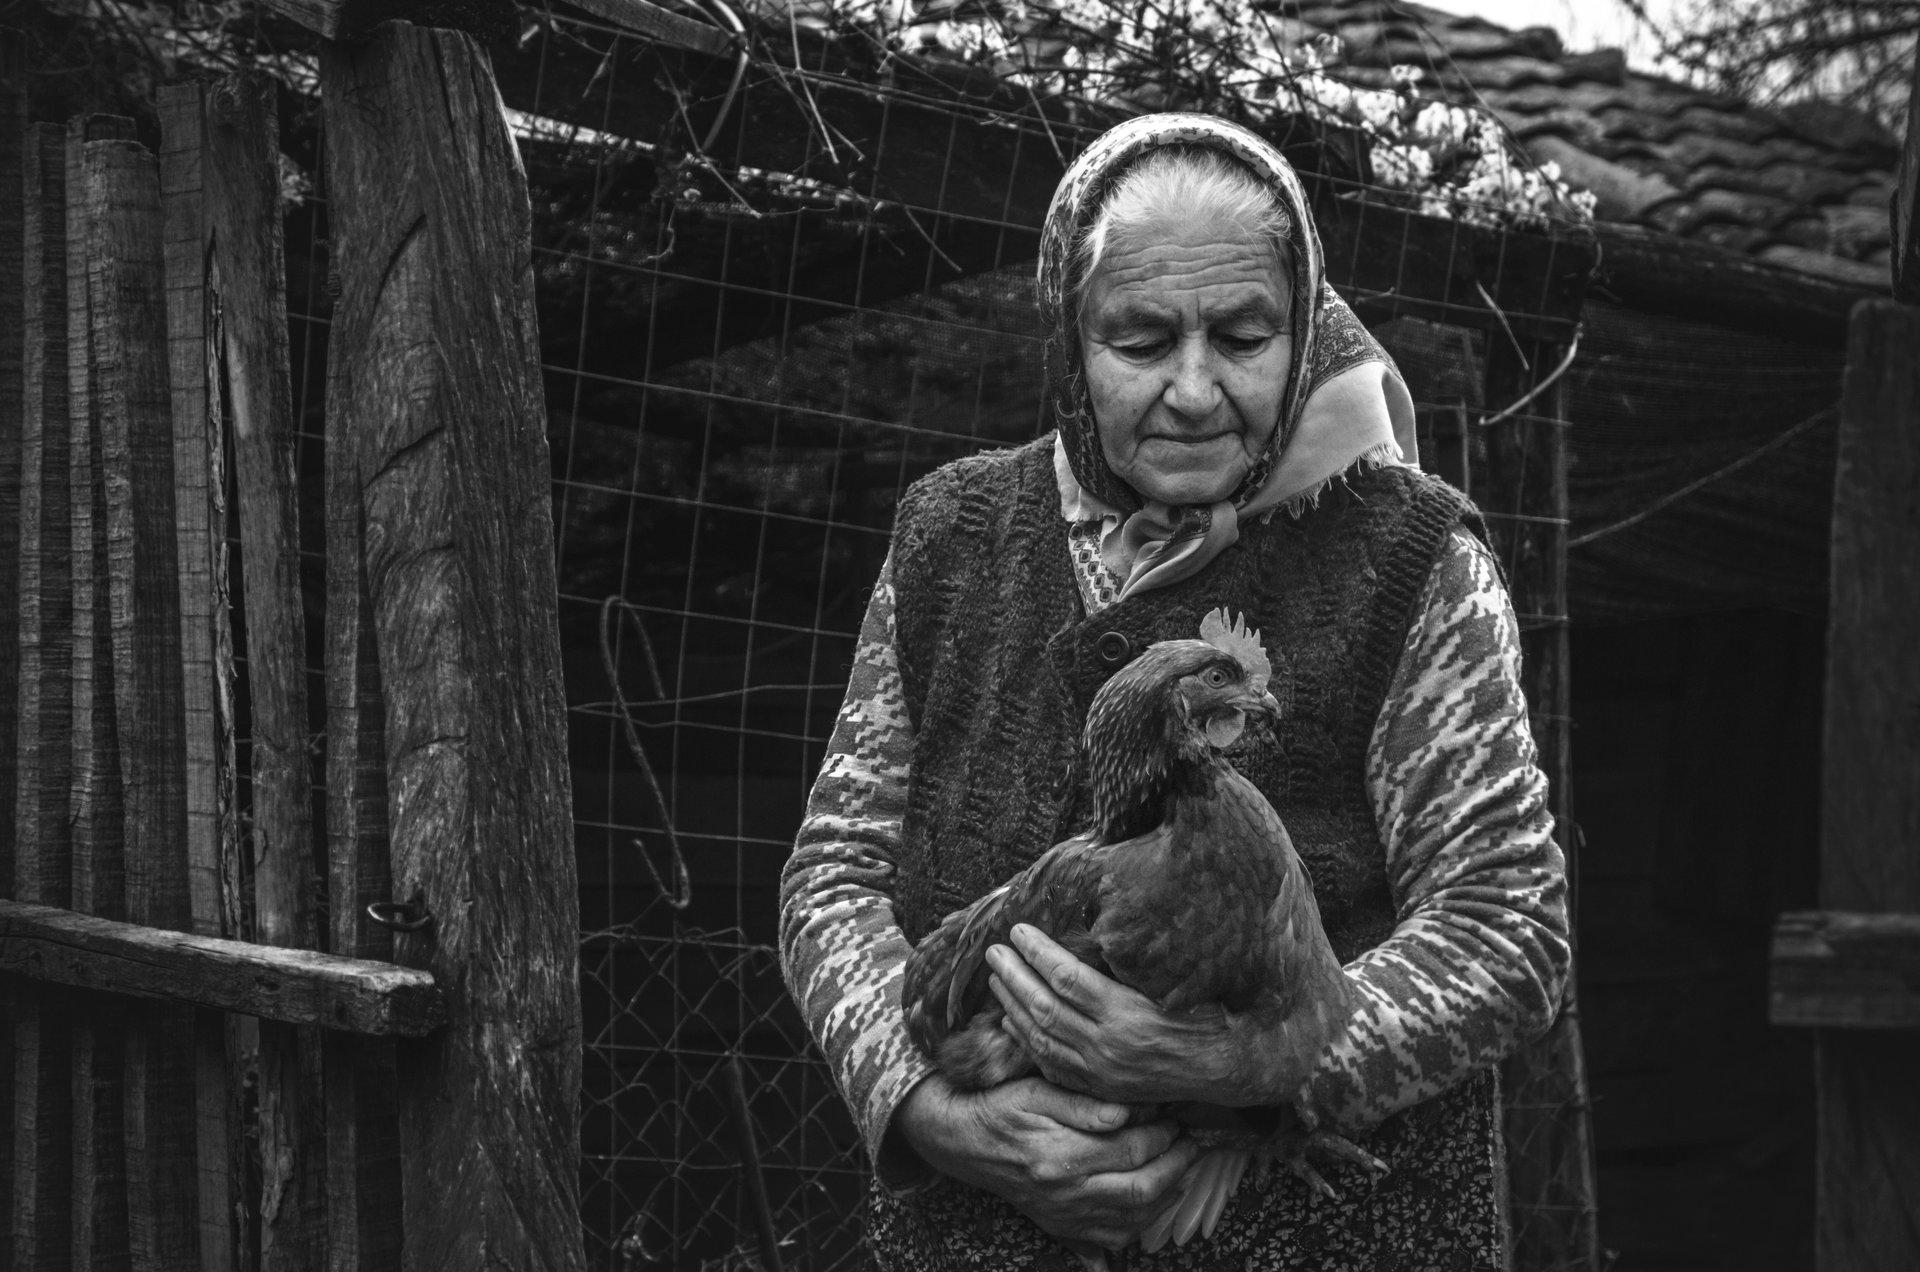 Photo in Portrait | Author Десислава Игнатова - desiignat | PHOTO FORUM